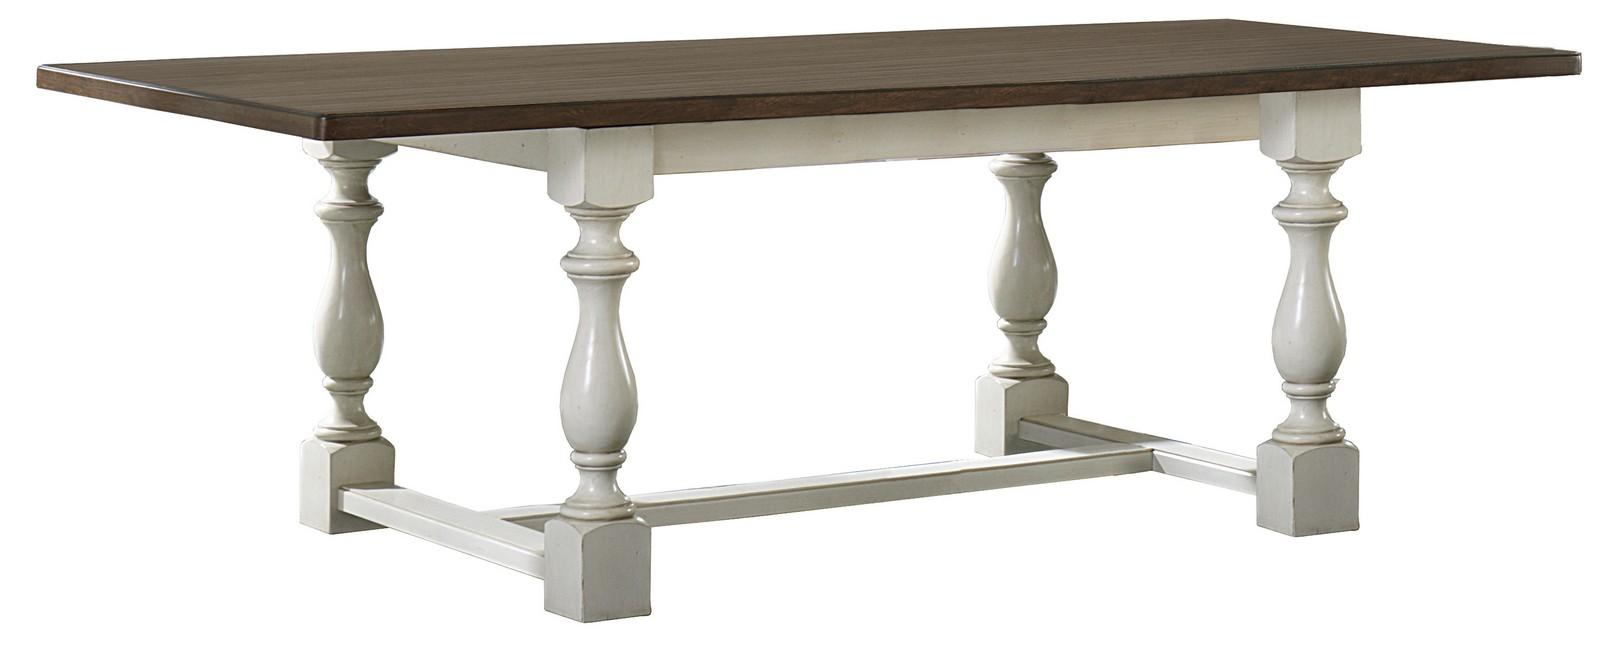 Hillsdale Pine Island Leg Trestle Table - Old White